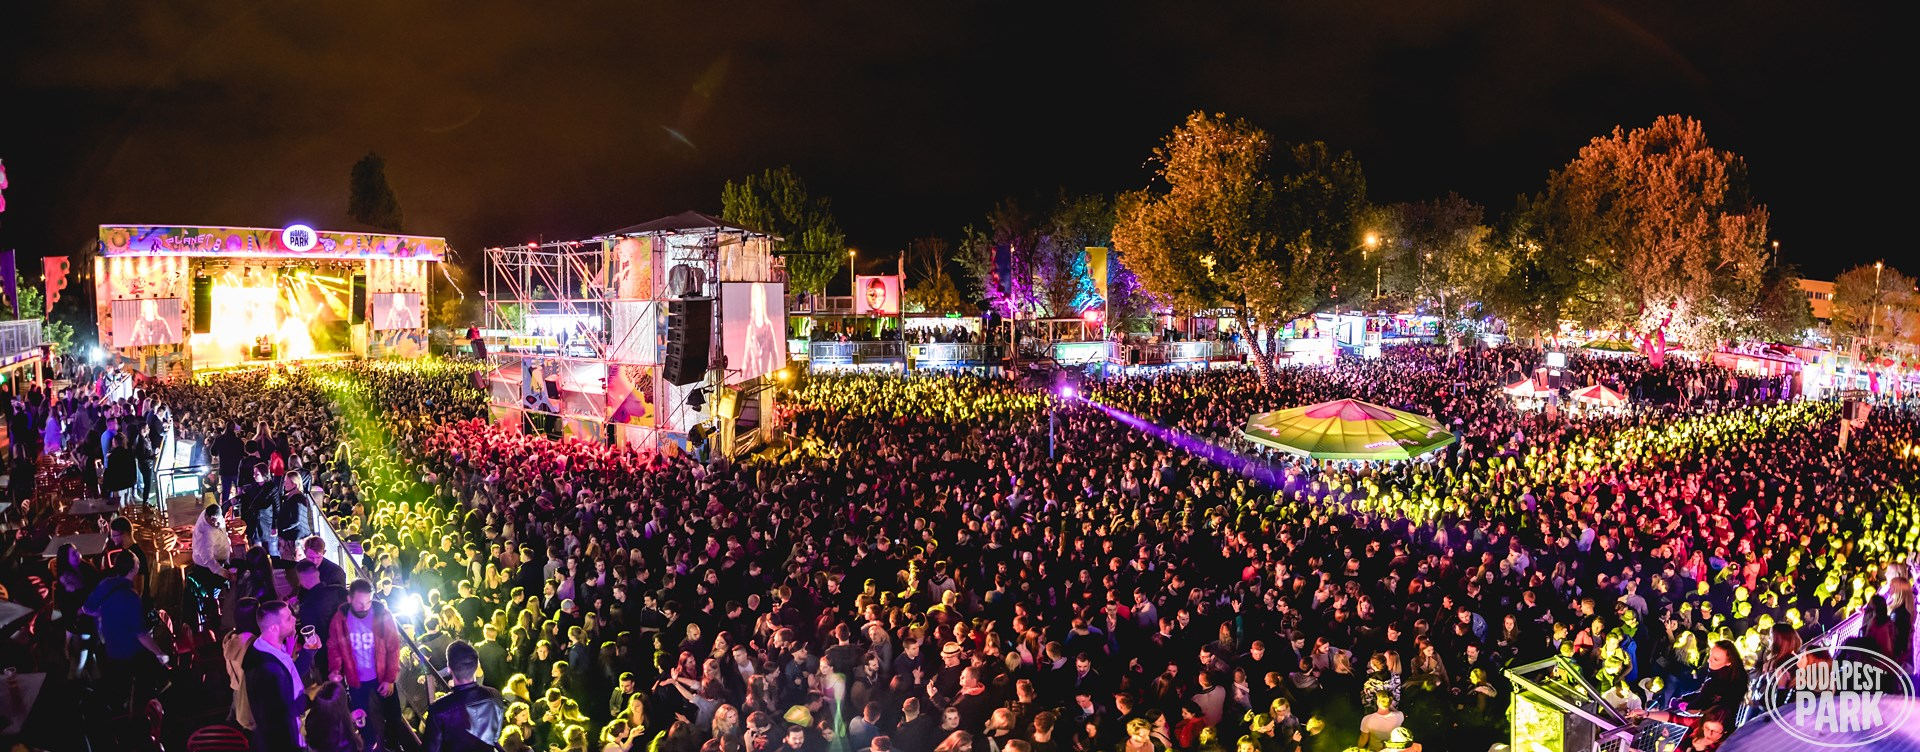 budapest park concerts